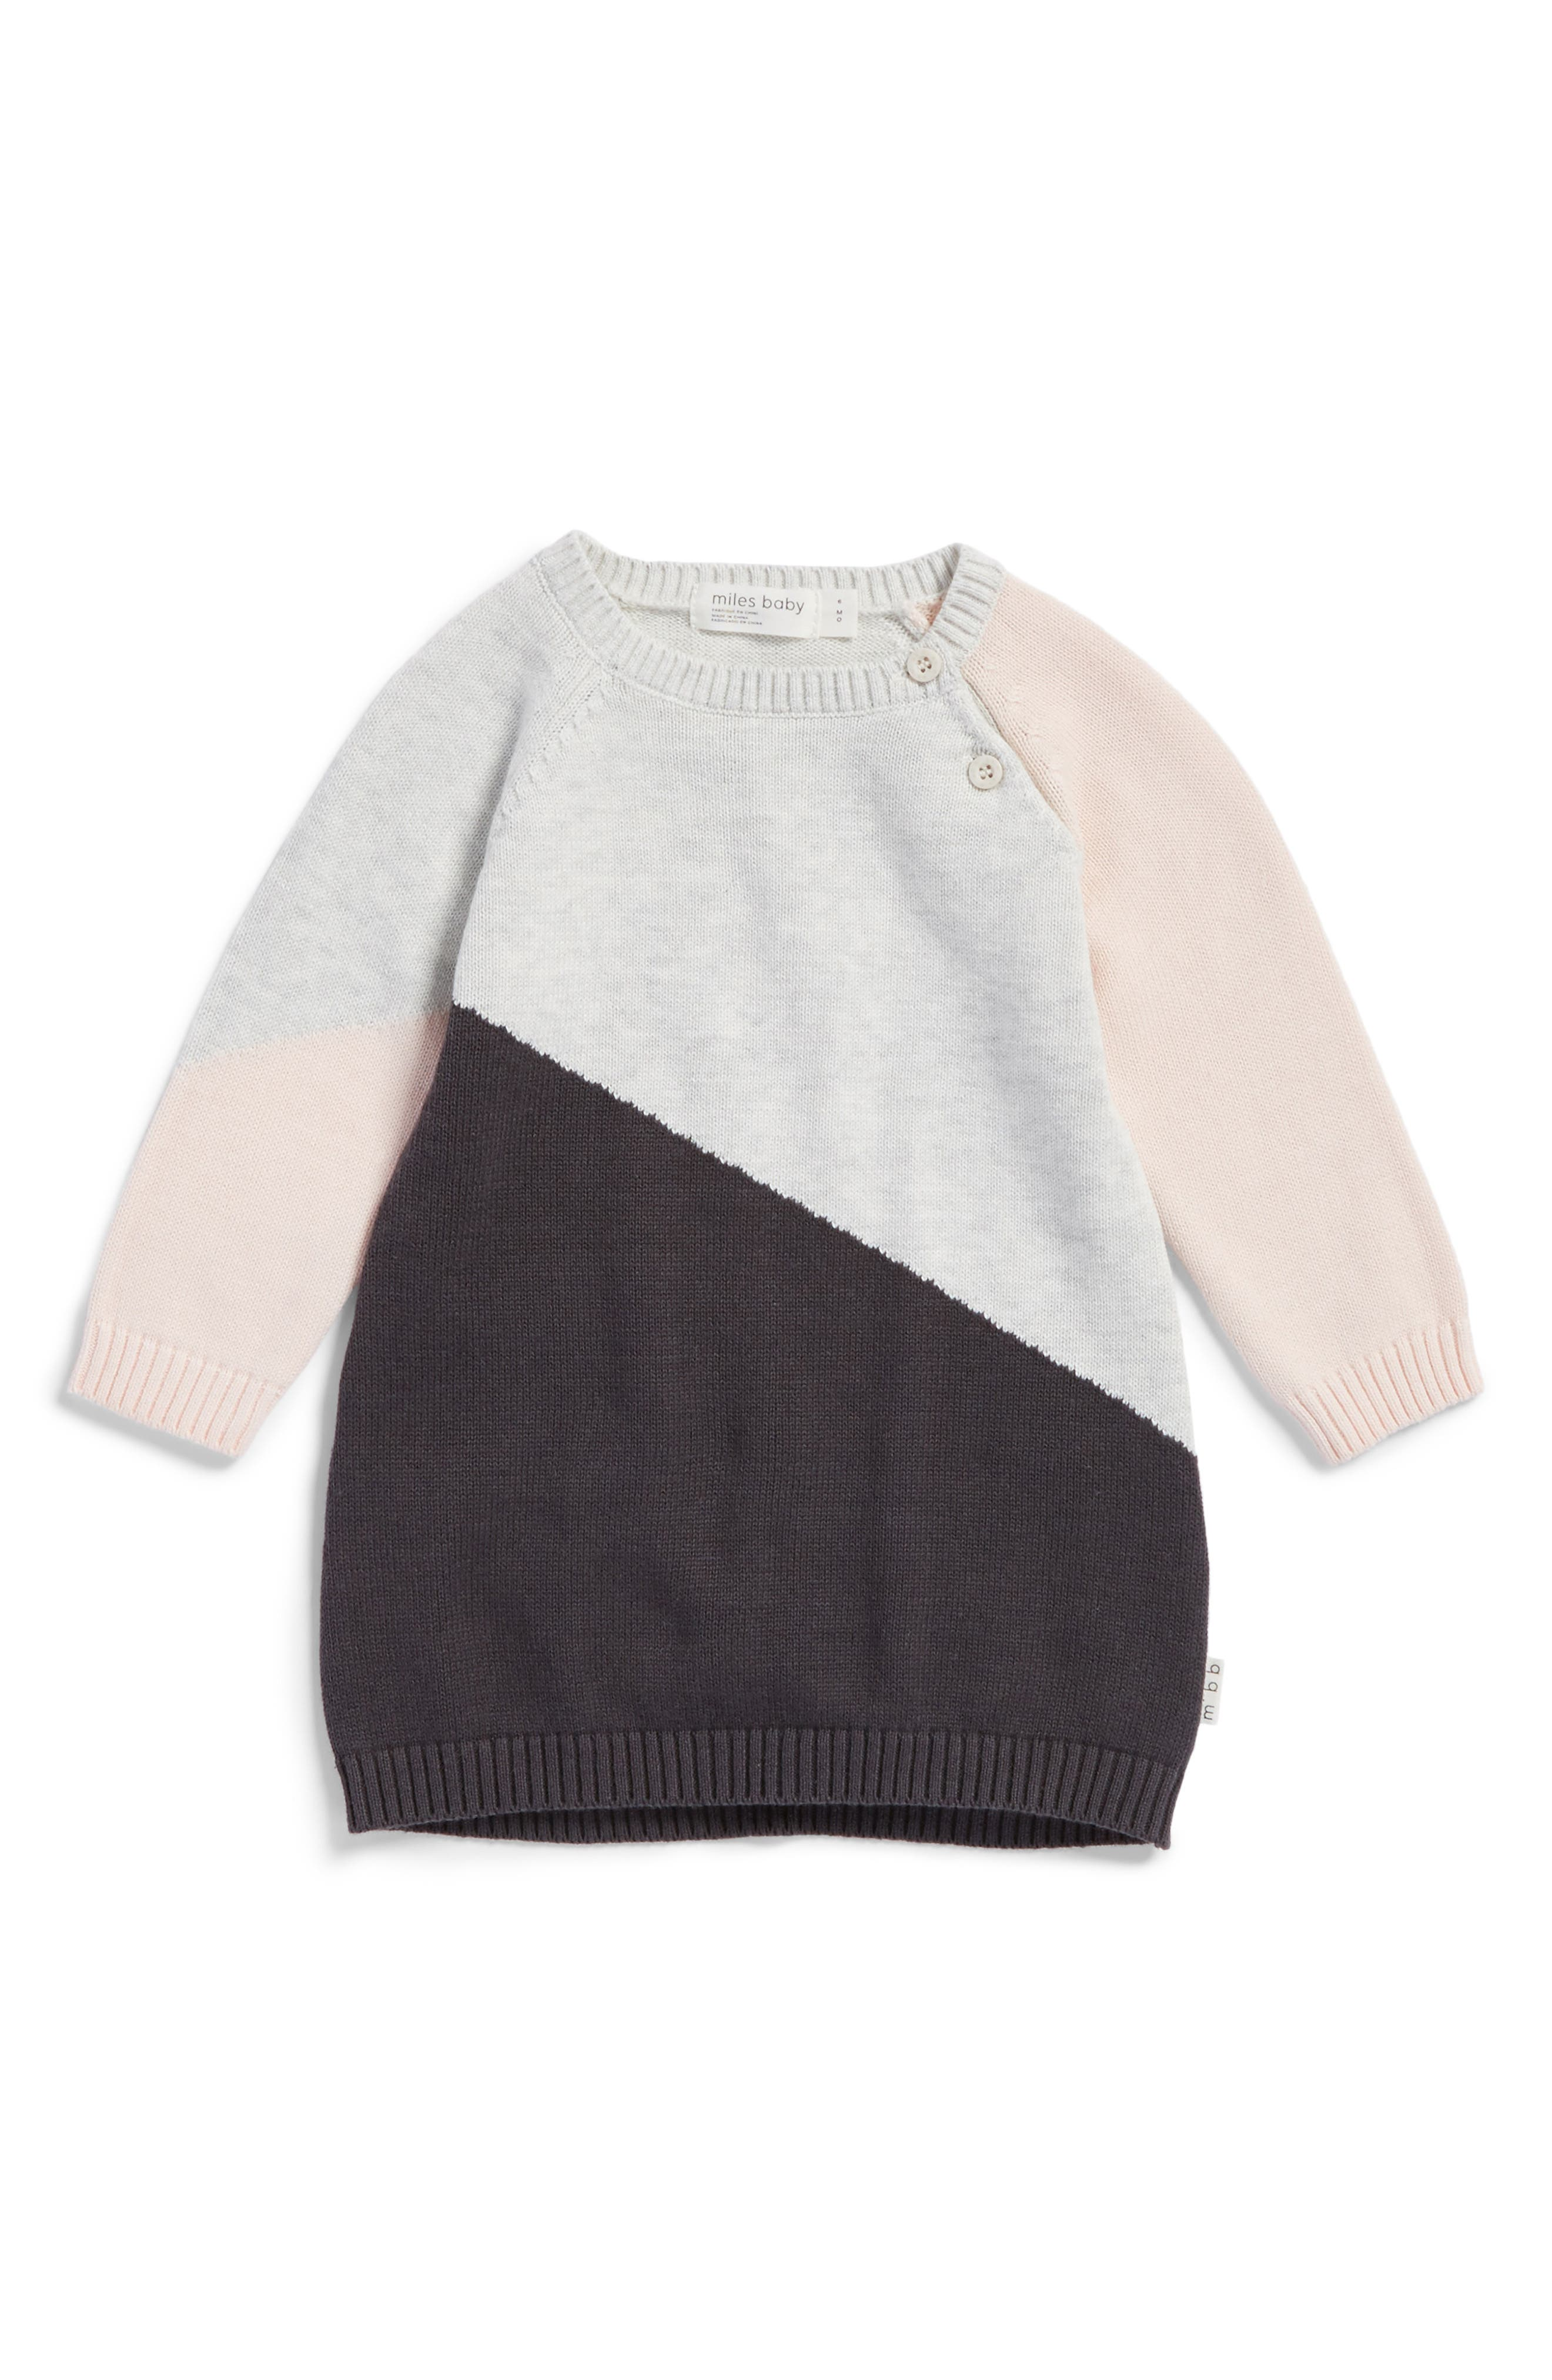 Knit Sweater Dress,                             Main thumbnail 1, color,                             060